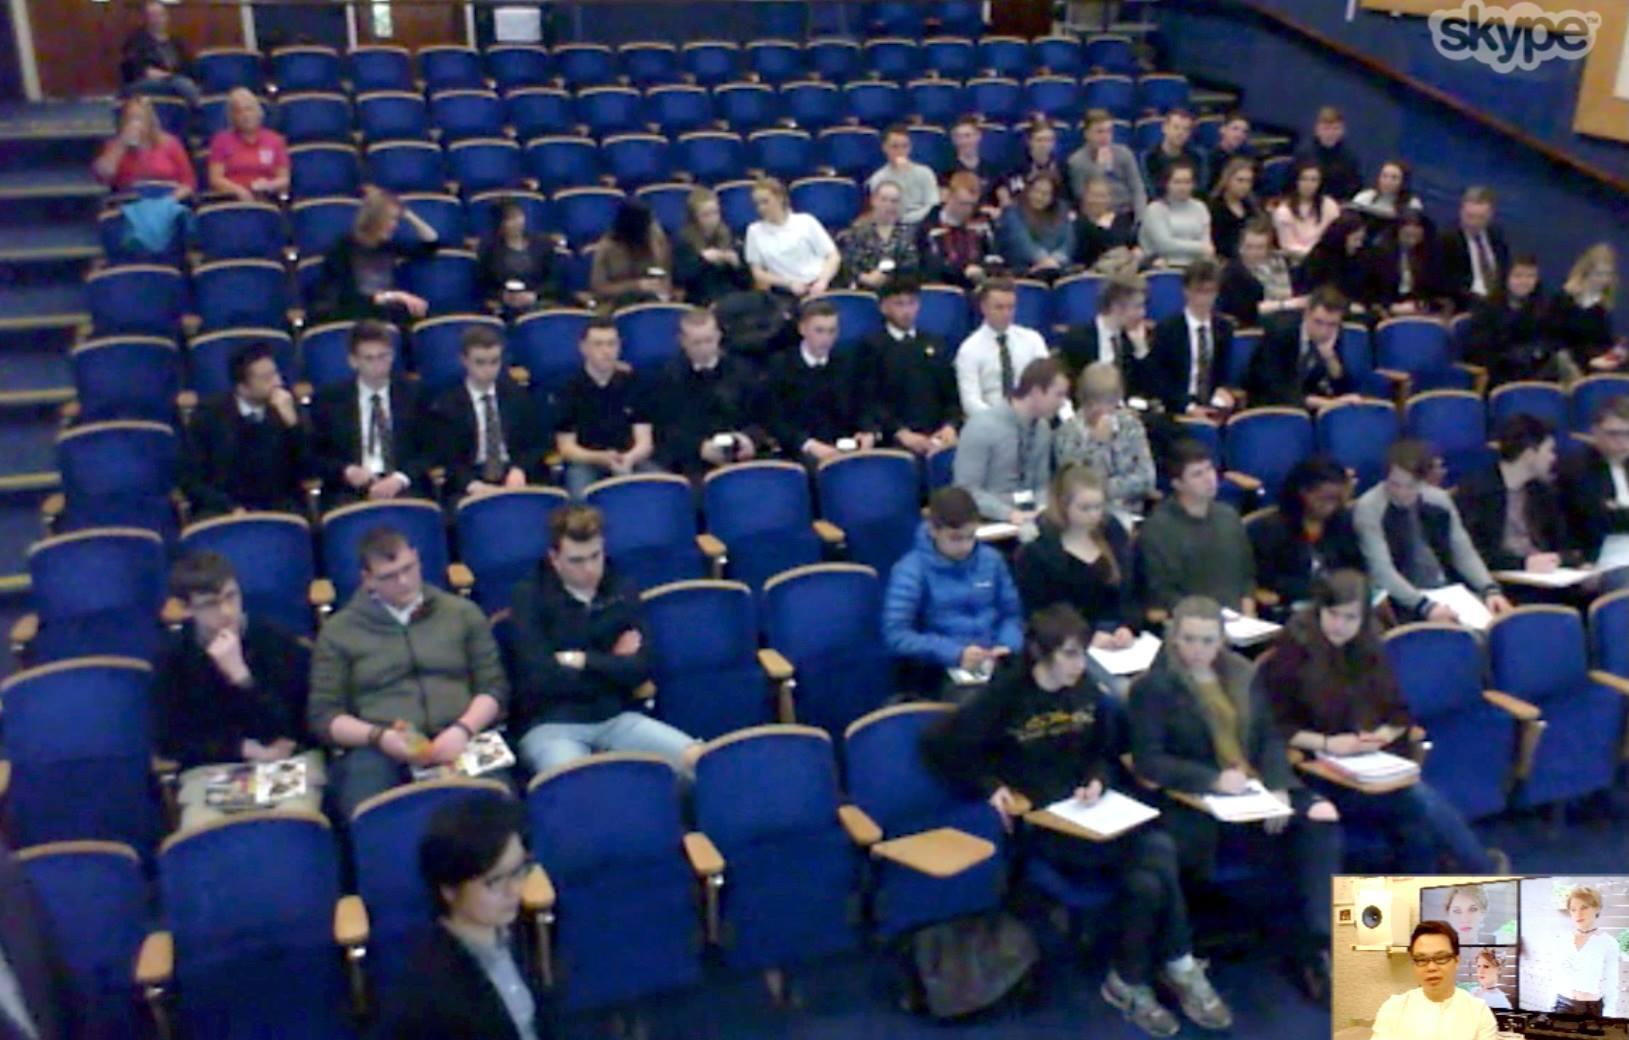 Glyndwr University, UK